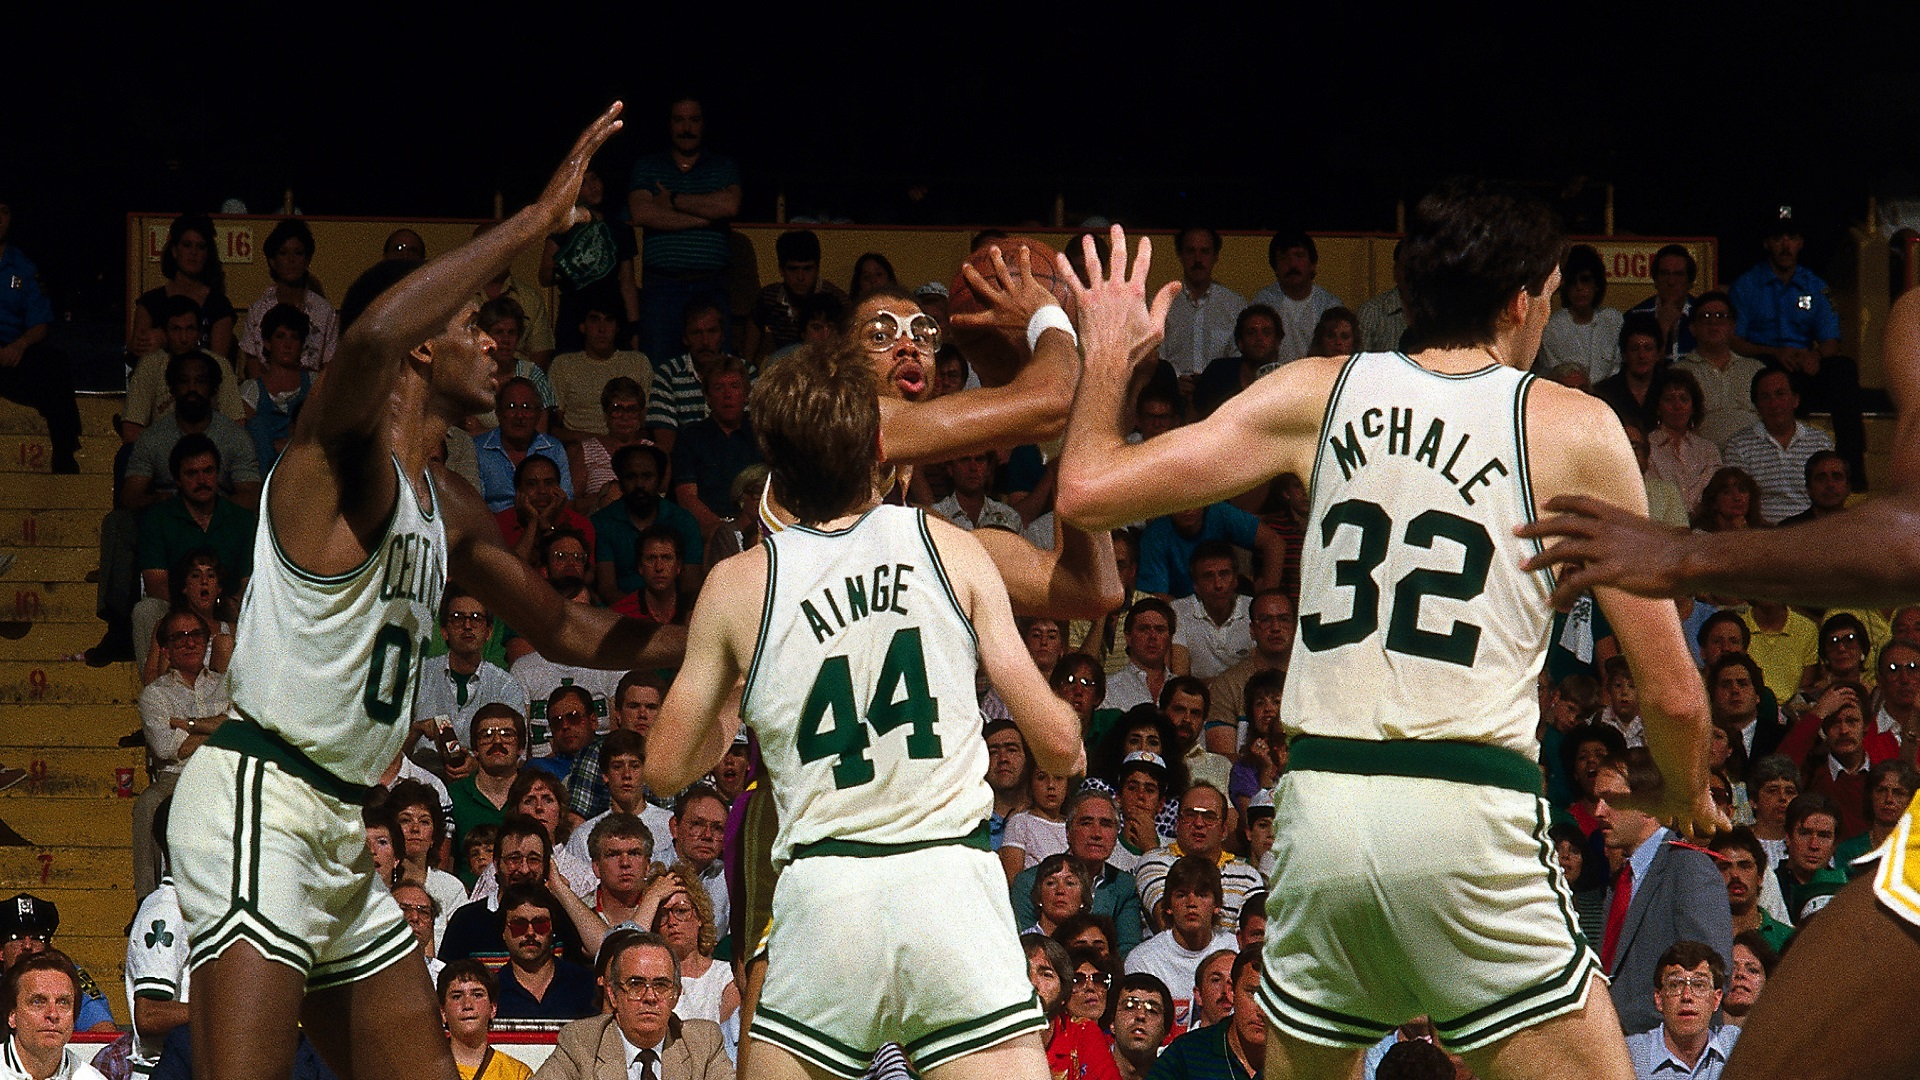 Top Moments: Kareem Abdul-Jabbar turns back clock in 1985 Finals